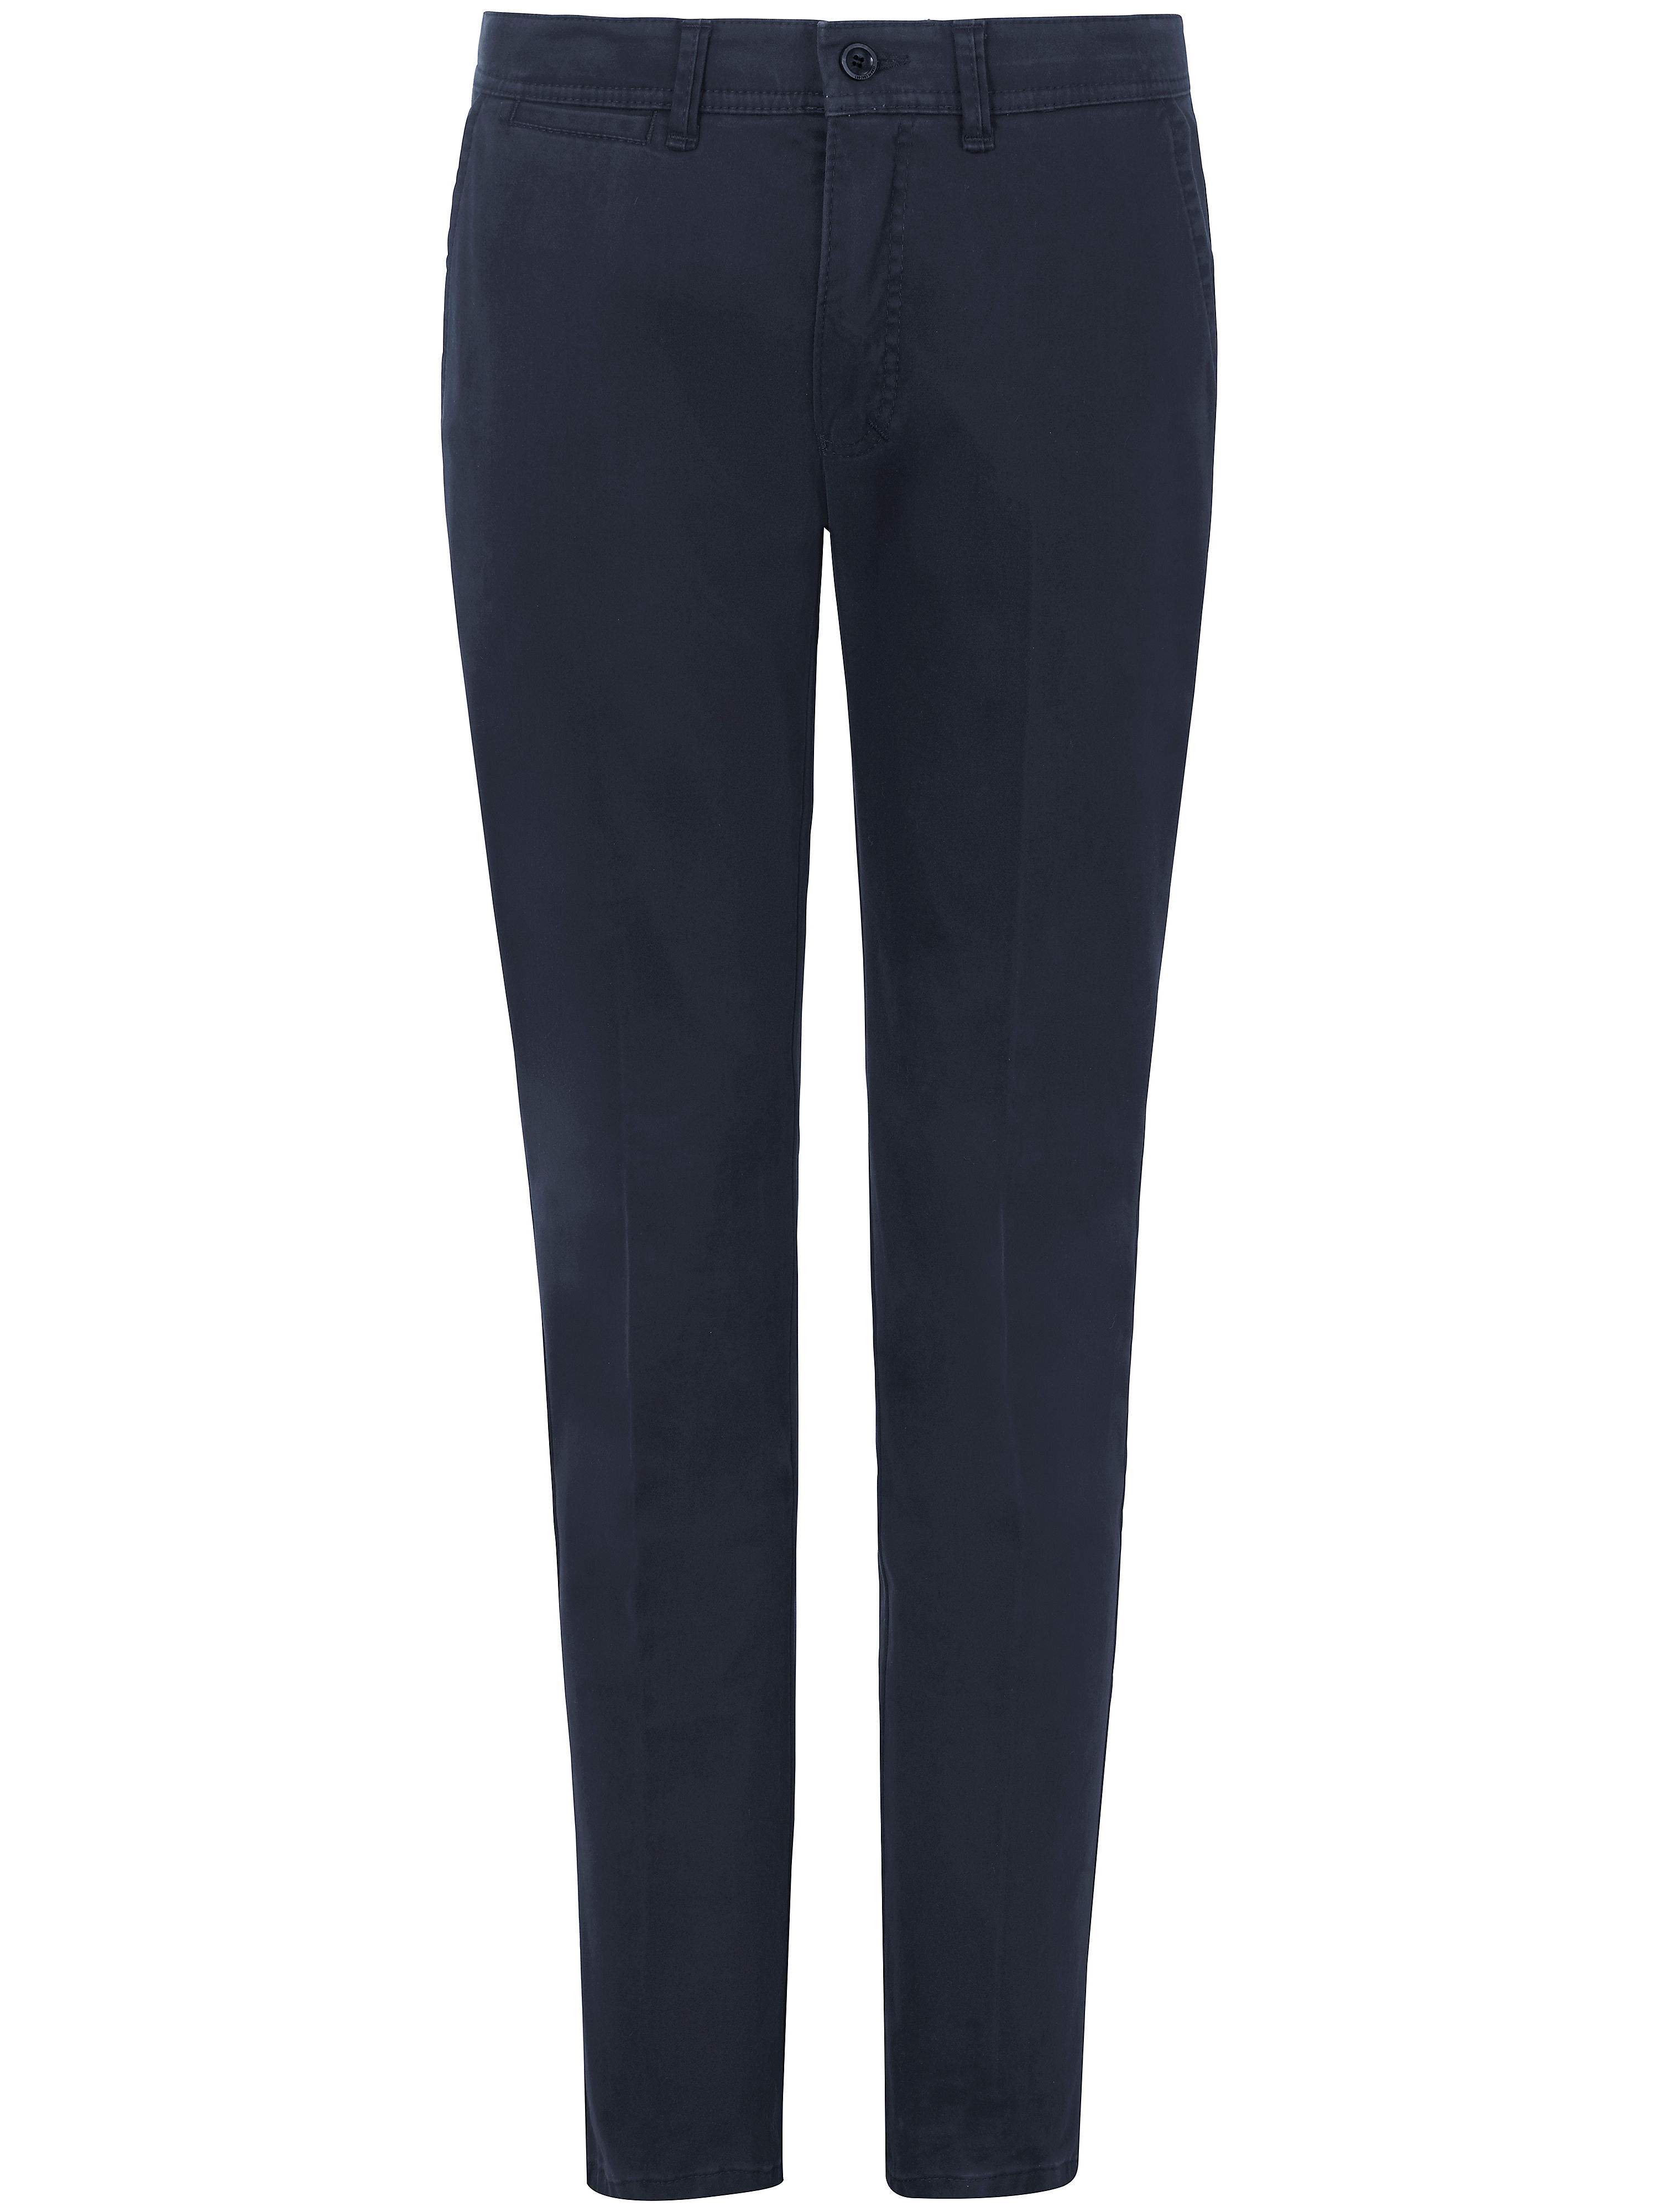 Le pantalon modèle Garvey  CLUB OF COMFORT bleu